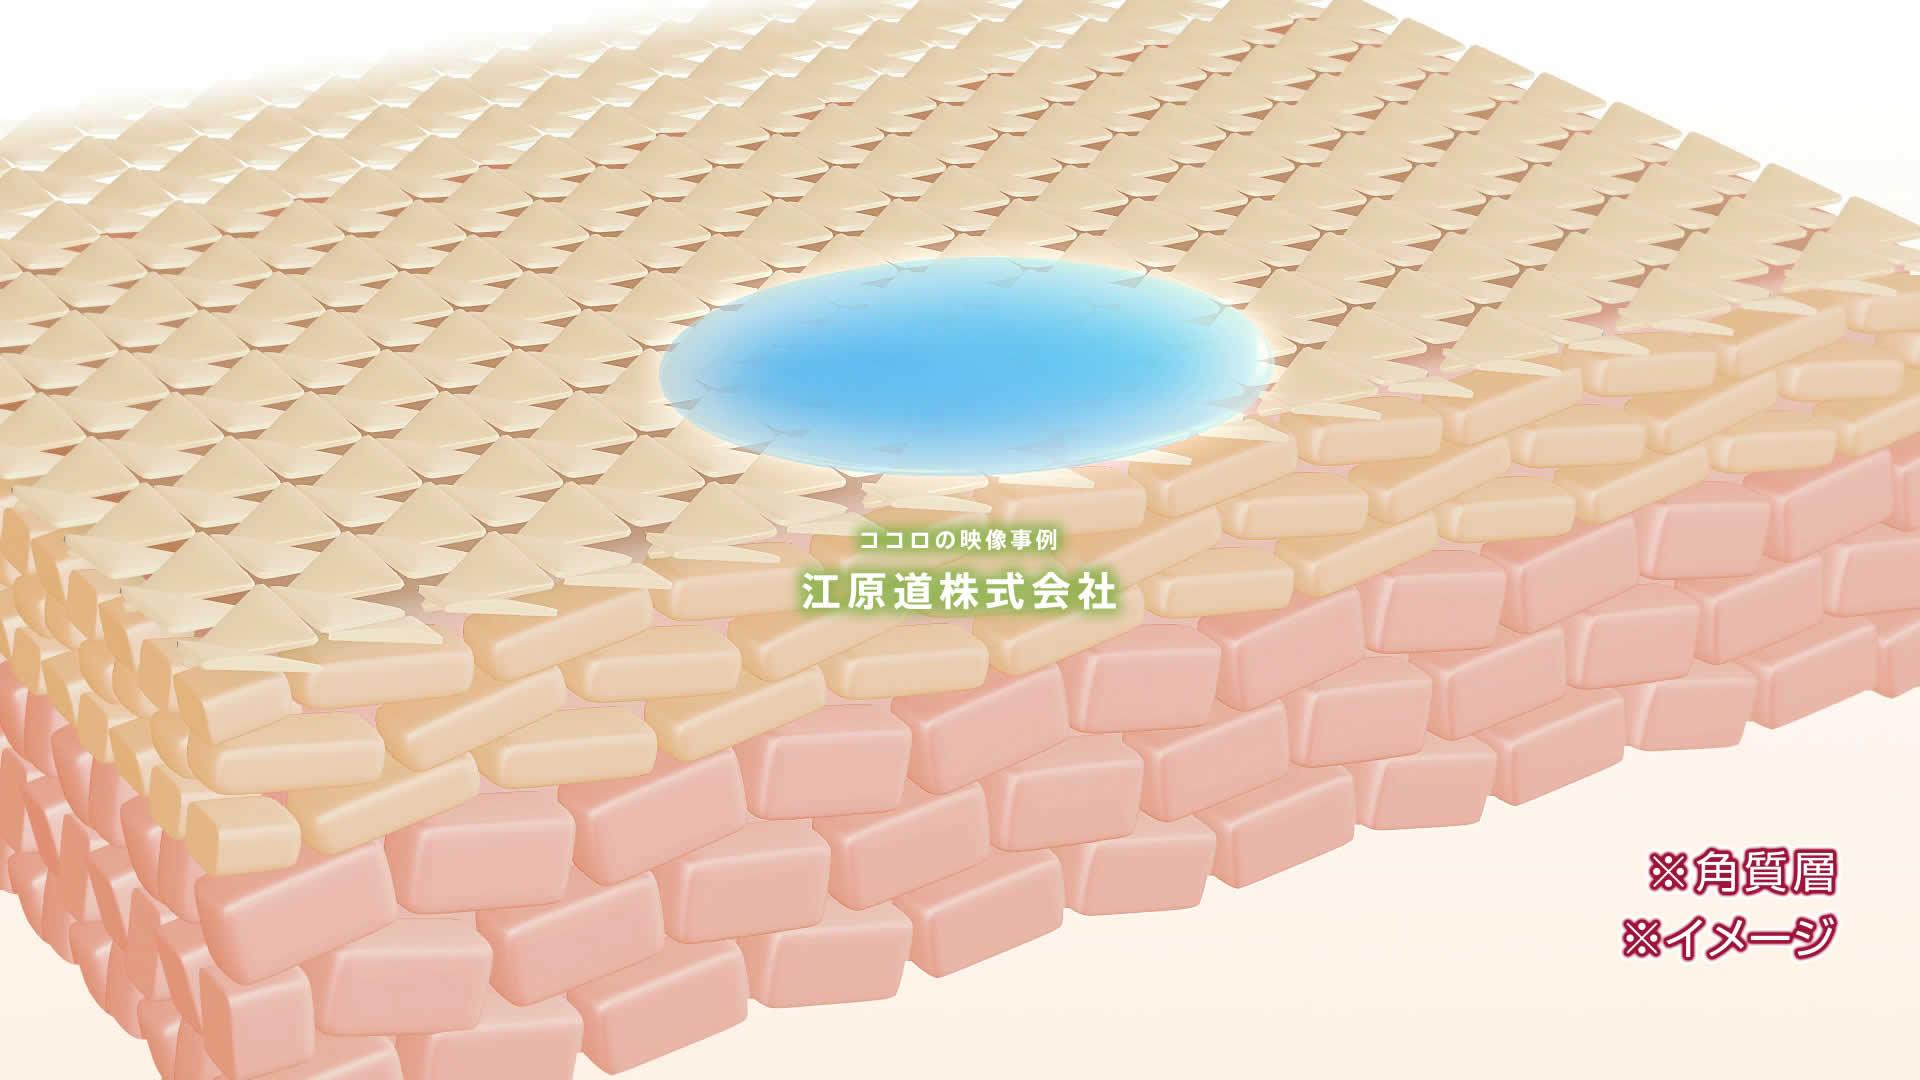 3DCG アニメーション映像制作「江原道株式会社」